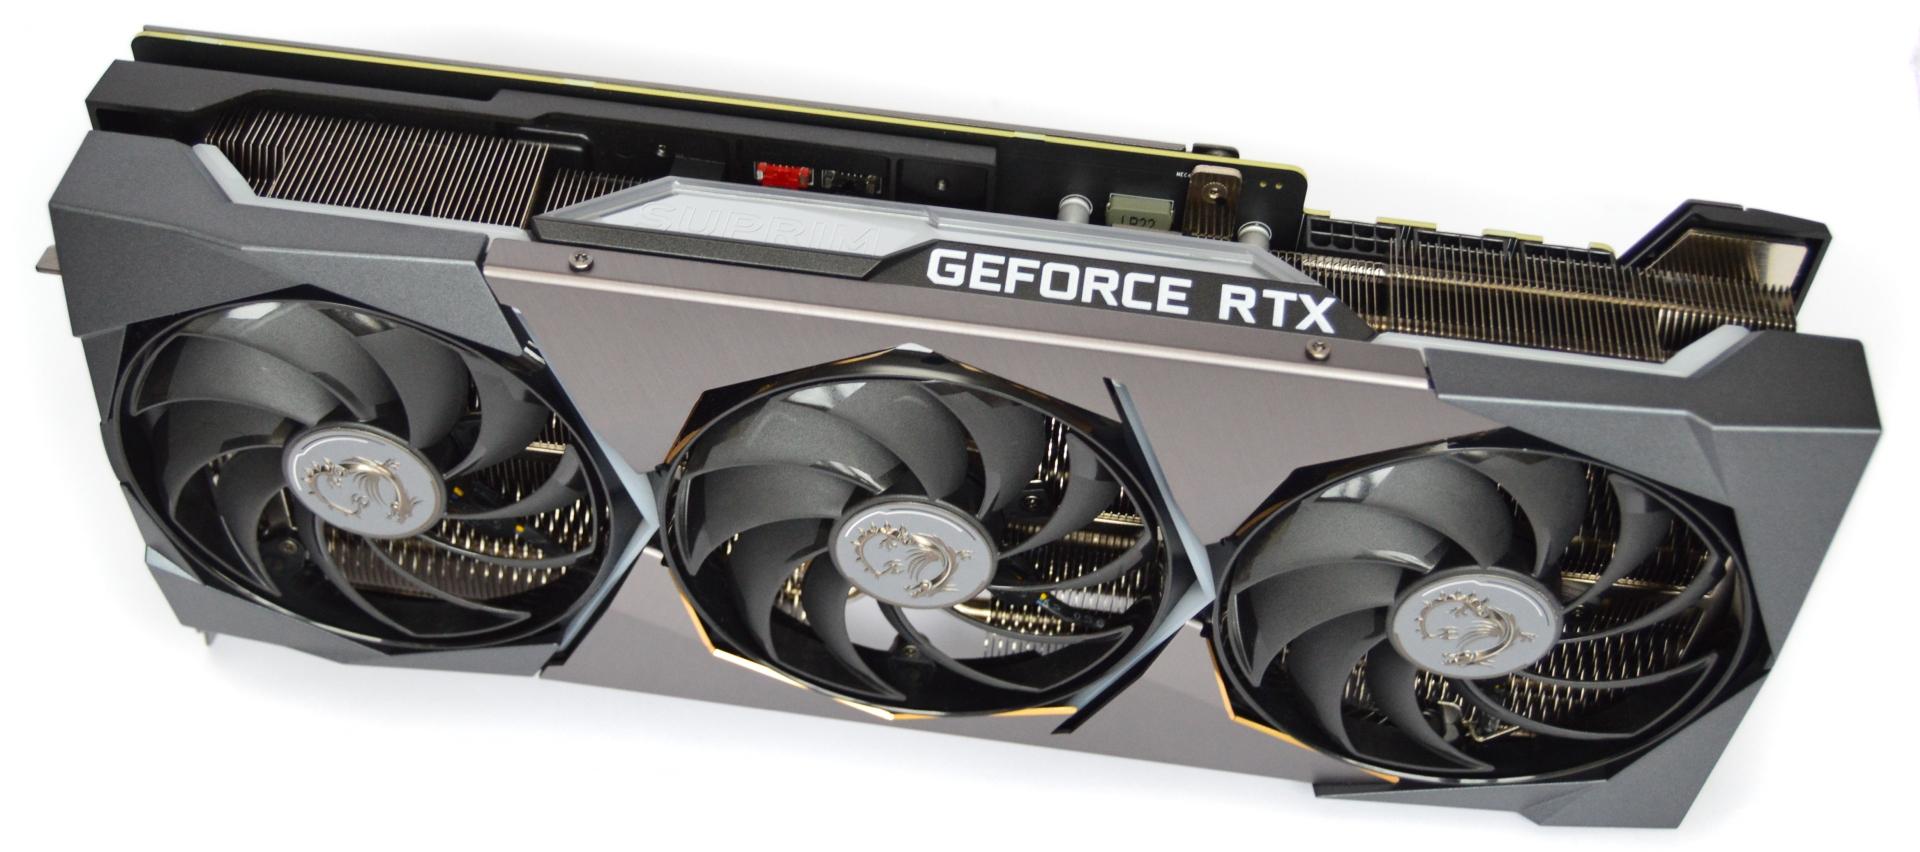 MSI GeForce RTX 3080 Suprim X